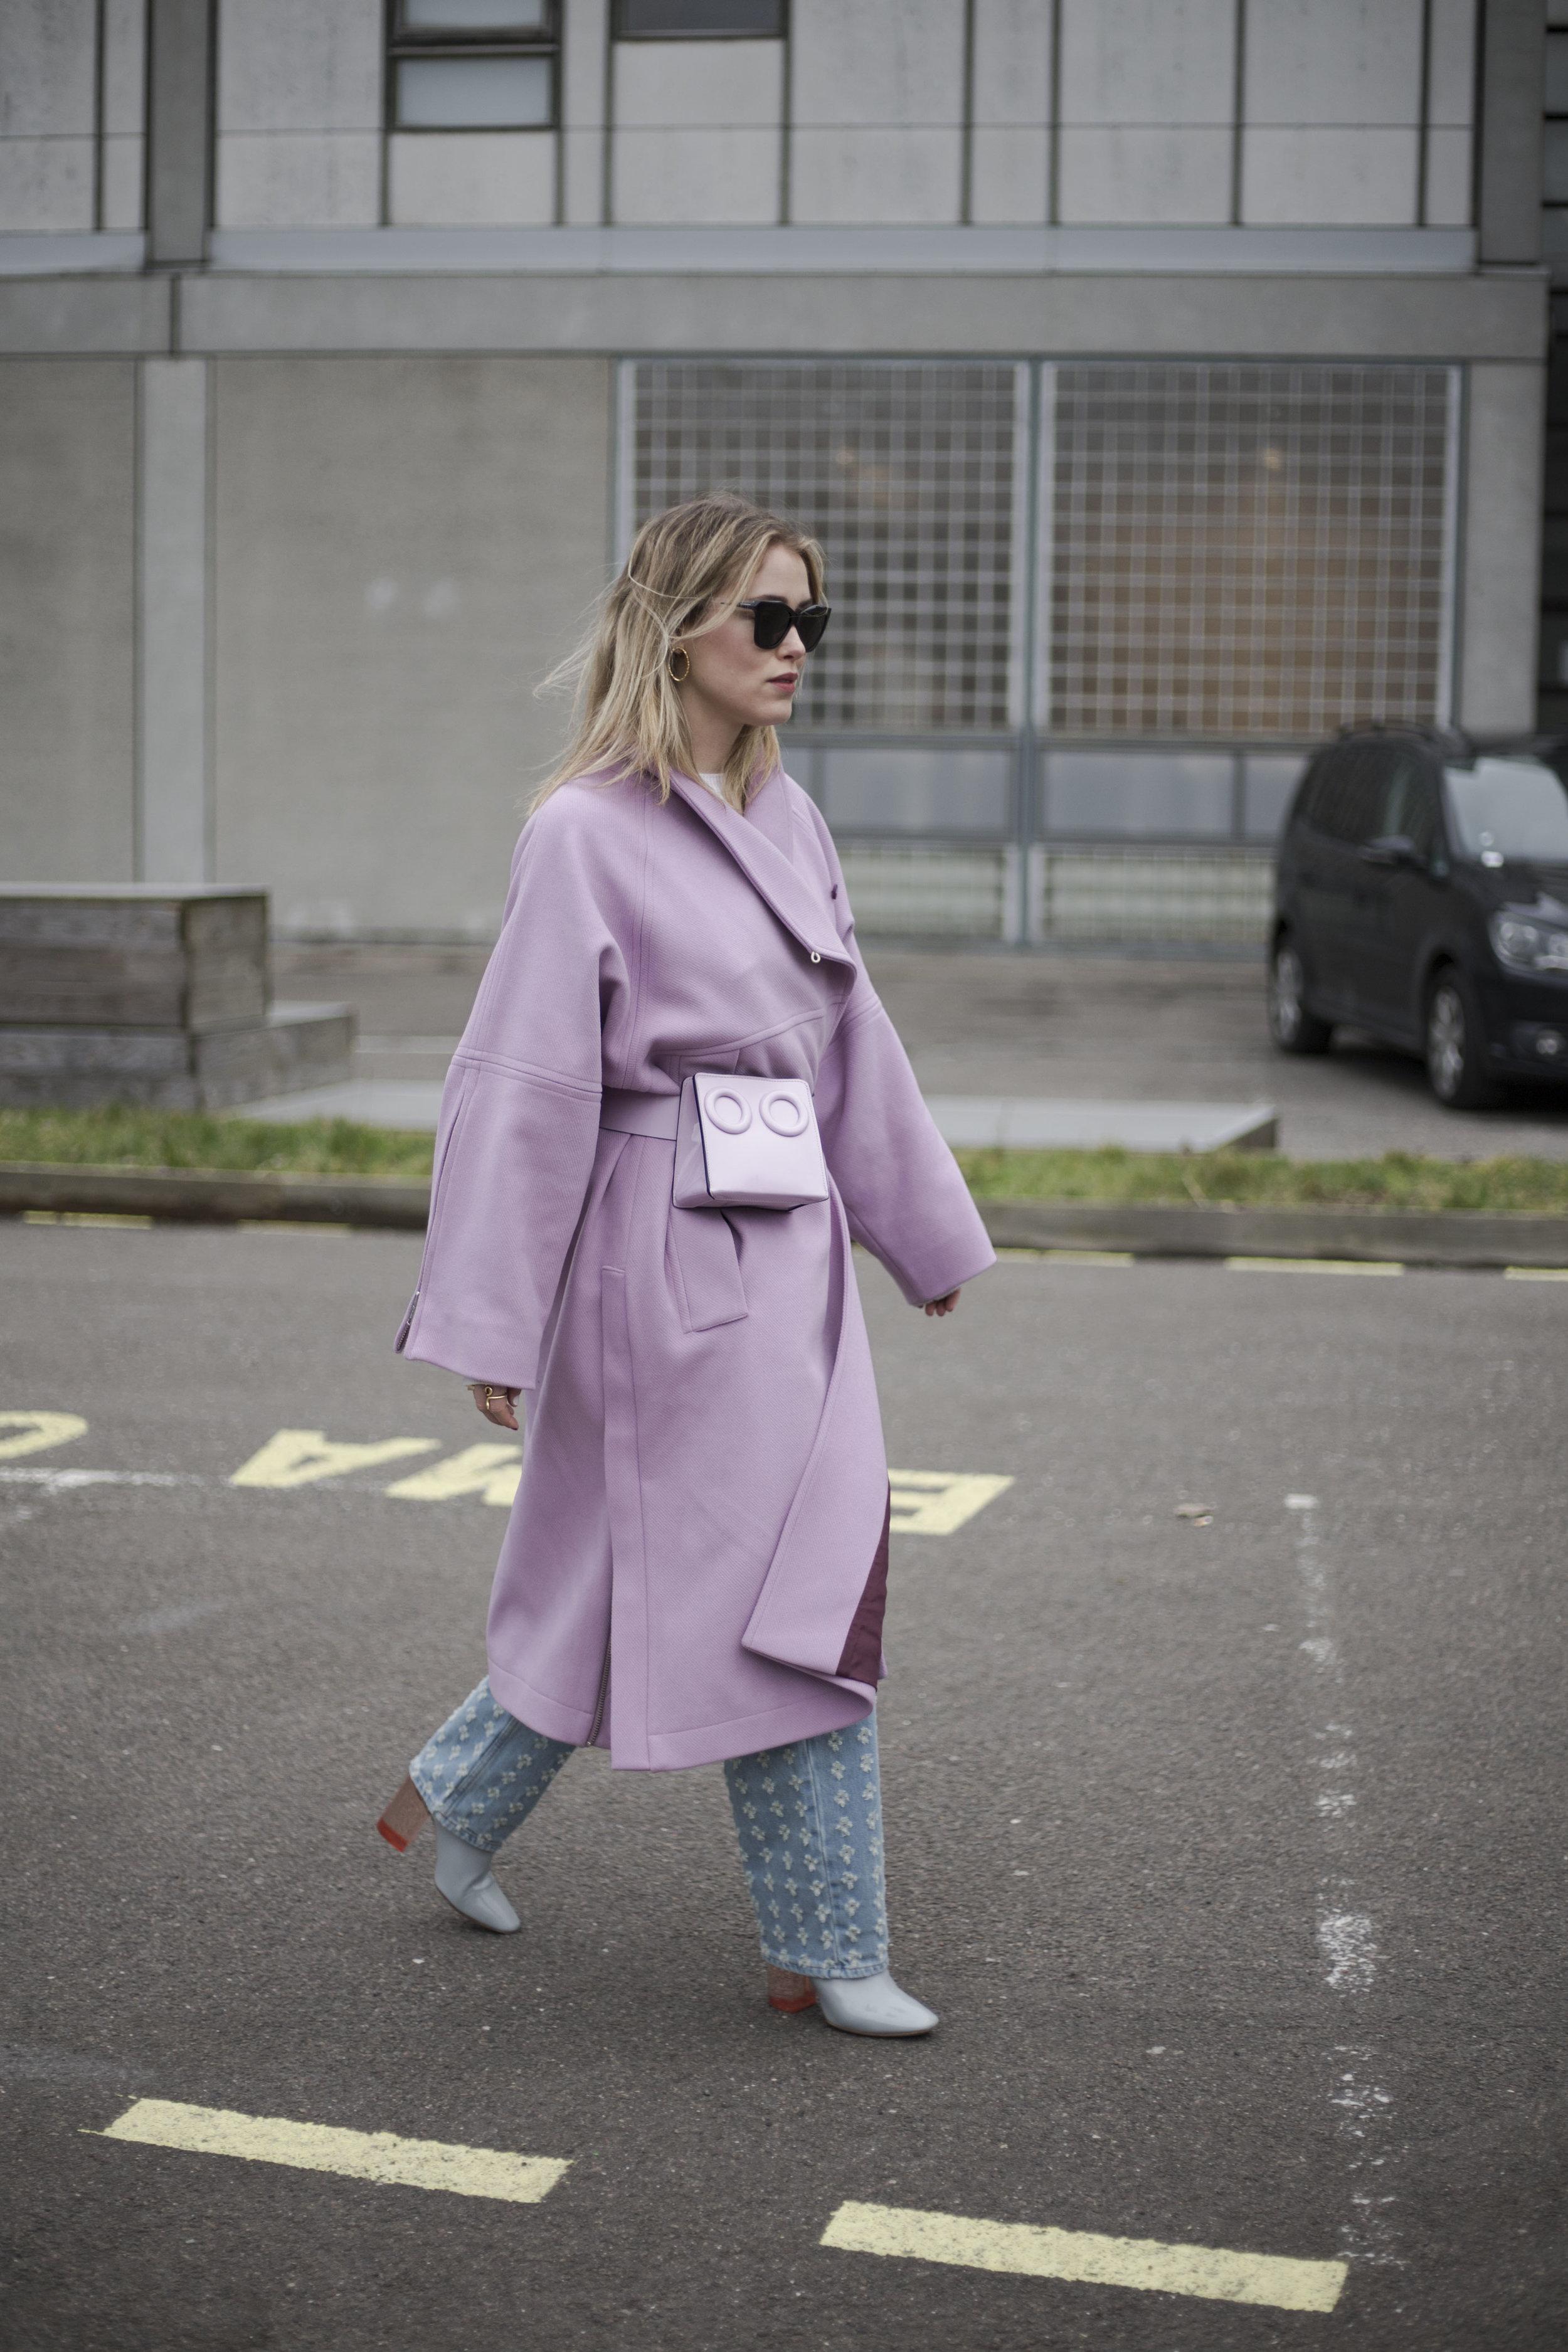 annabel-rosendahl-copenhagen-fashion-week-scandinavian-street-style-streetstyle-thestreetland-fashion-best-style.jpg